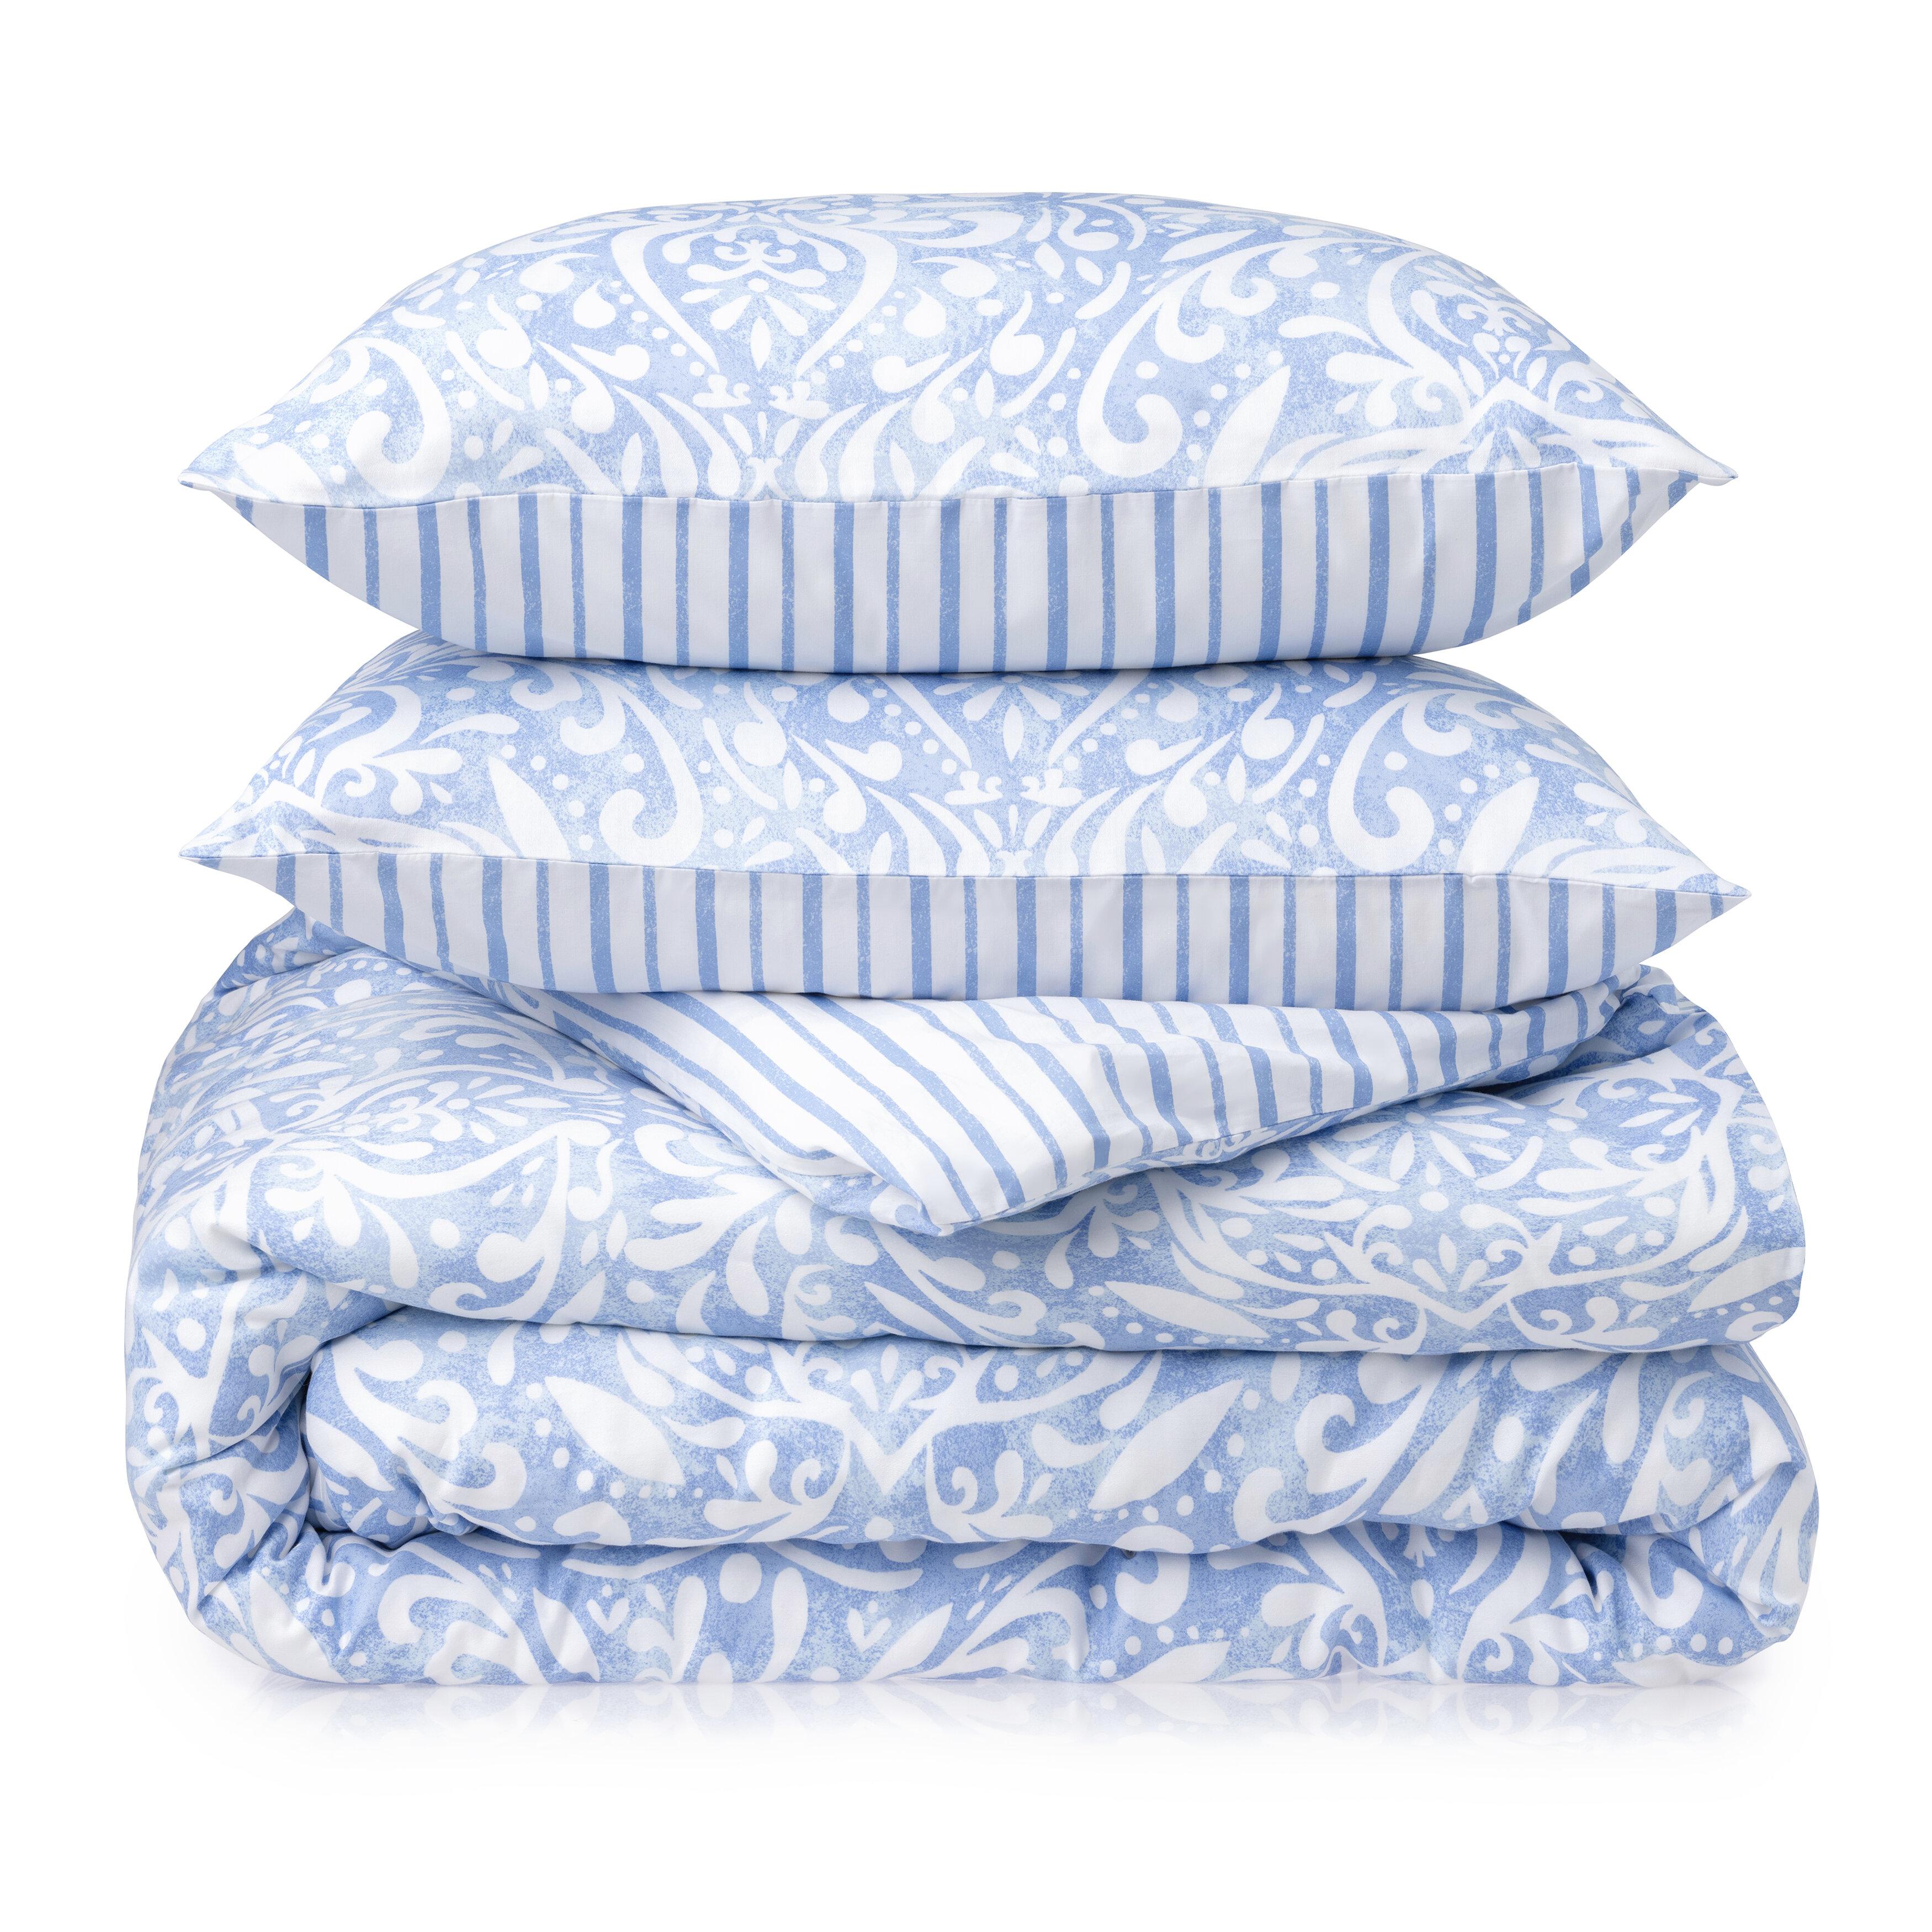 Queen, Ivory White Martha Stewart Easy Care Soft Fleece Blanket